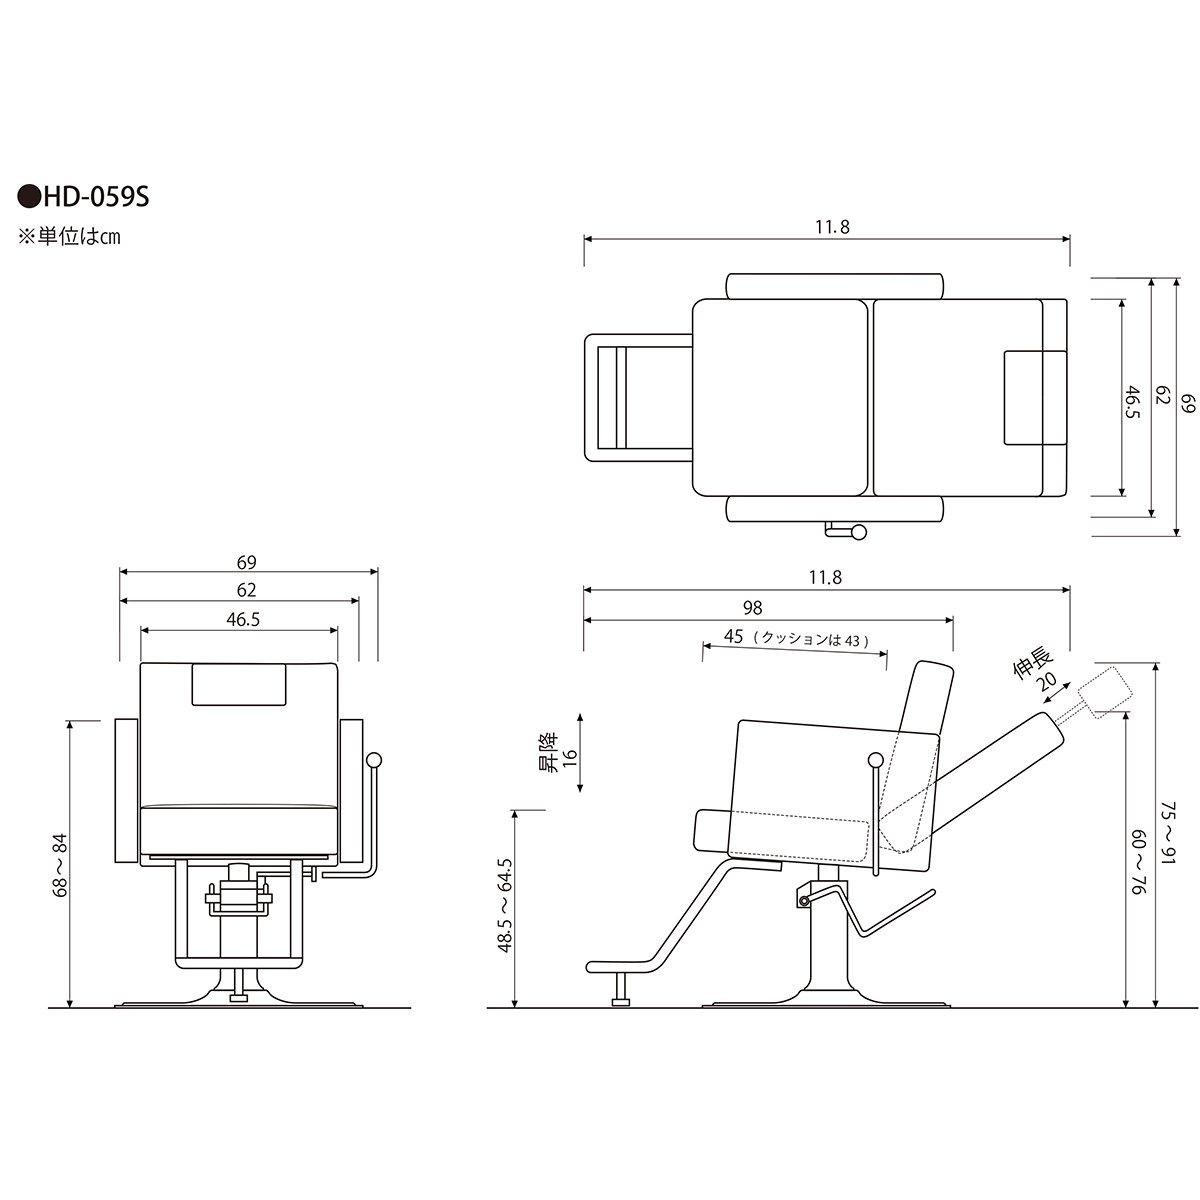 <img class='new_mark_img1' src='https://img.shop-pro.jp/img/new/icons29.gif' style='border:none;display:inline;margin:0px;padding:0px;width:auto;' />【新品】ビューティガレージ 『手動シャンプーチェア HD-059S』 ★選べる2色&ベース8タイプ!